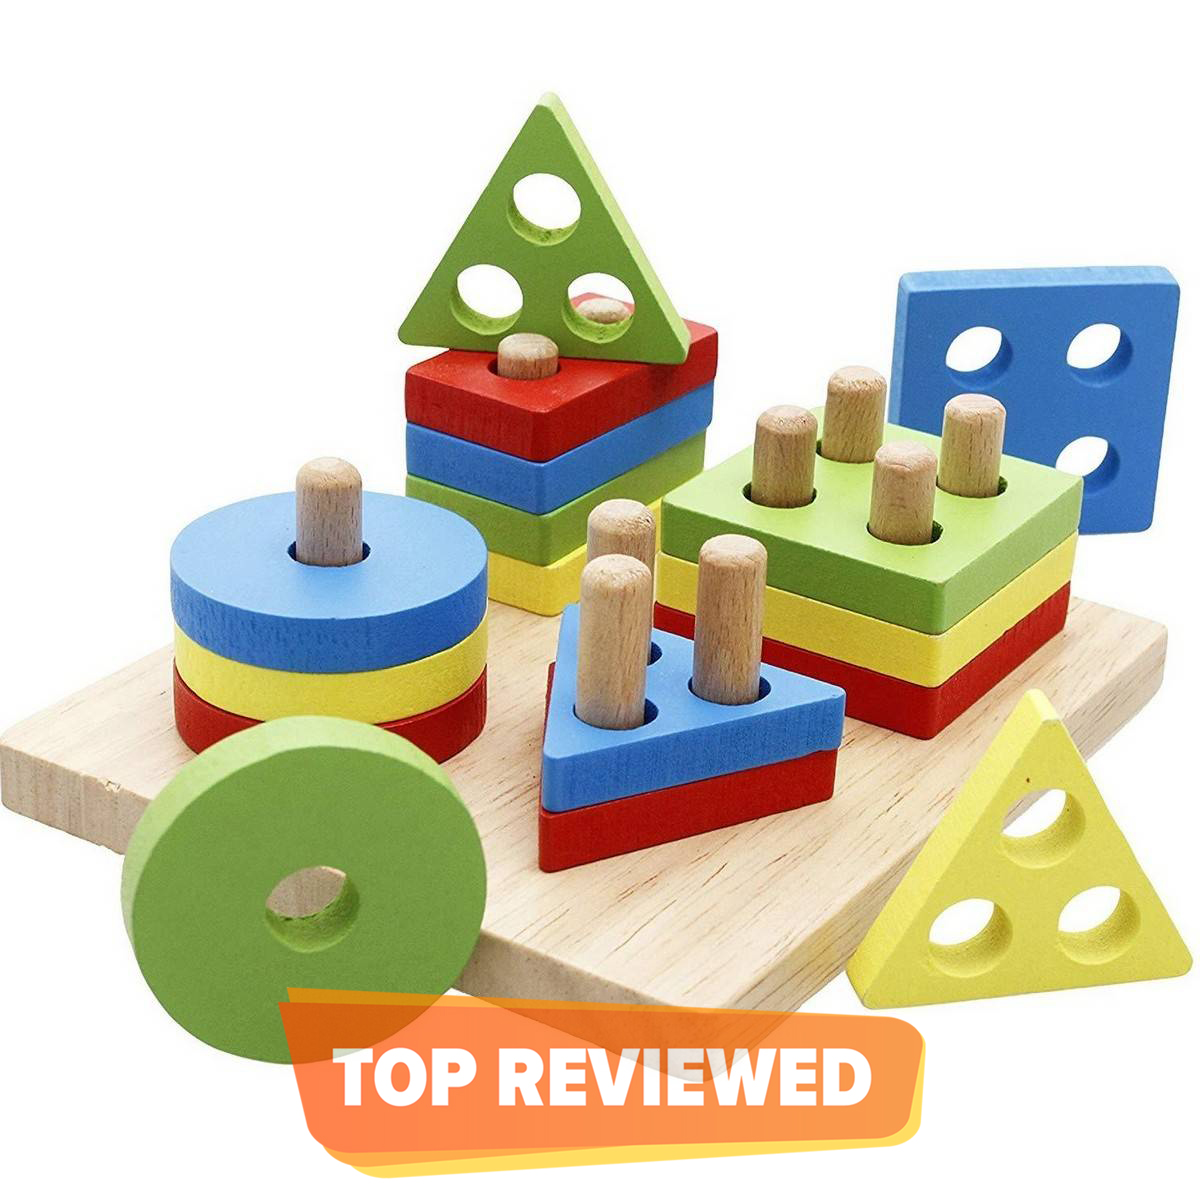 Lewo Wooden Puzzle Toddler Toys Shapes Sorter Preschool Geometric Blocks Stacking Games for Kids Geometric Shape Sorter